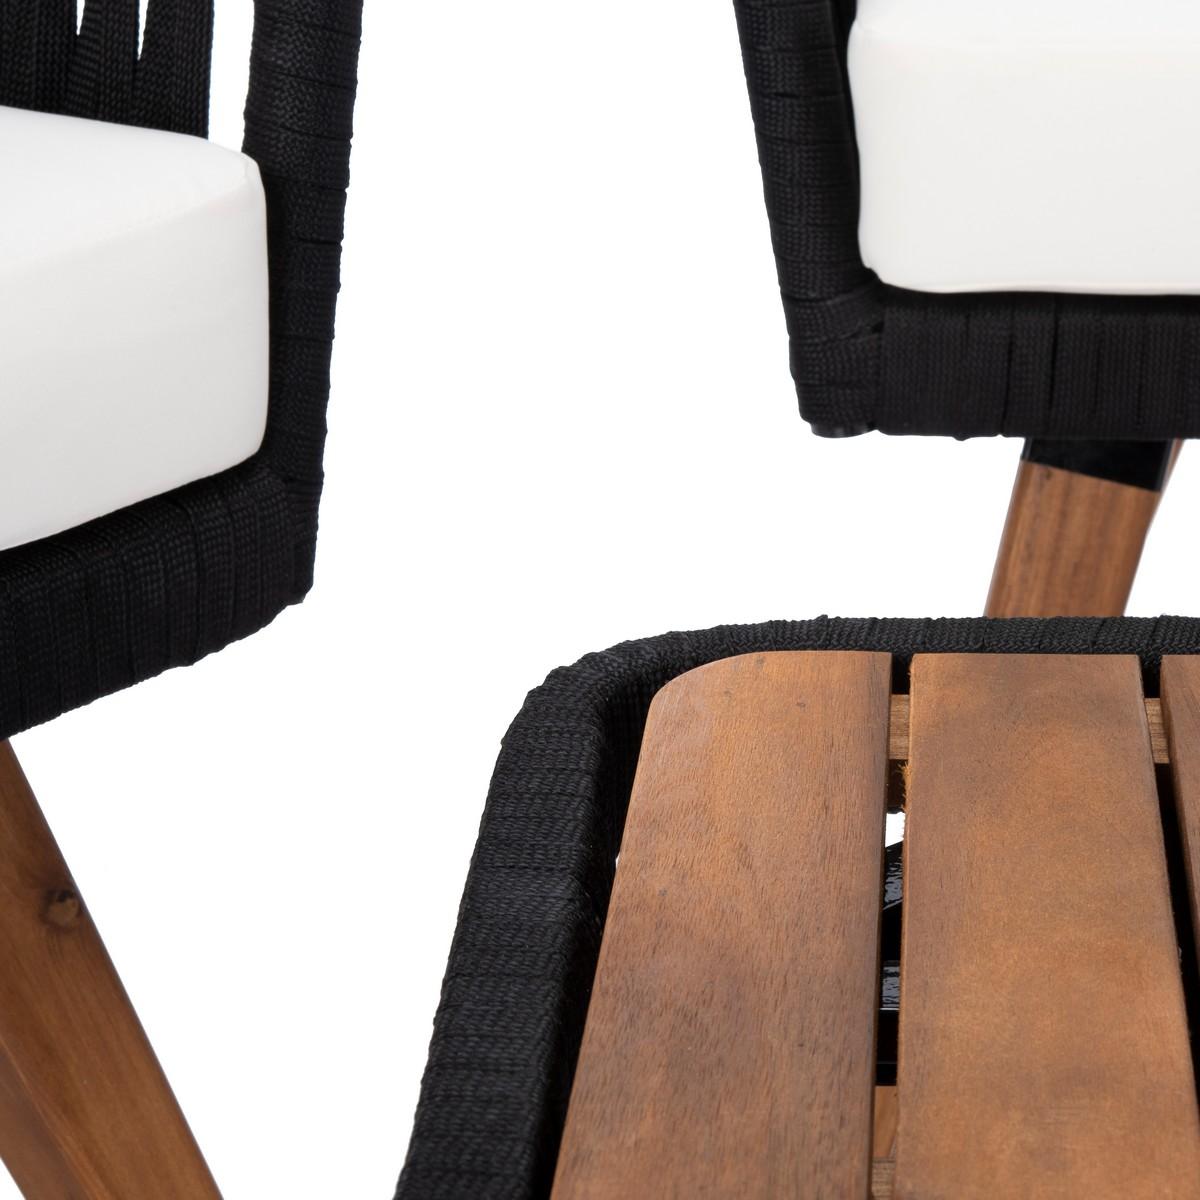 PAT7074B Patio Sets - 4 Piece - Furniture by Safavieh on Safavieh Ransin id=42957